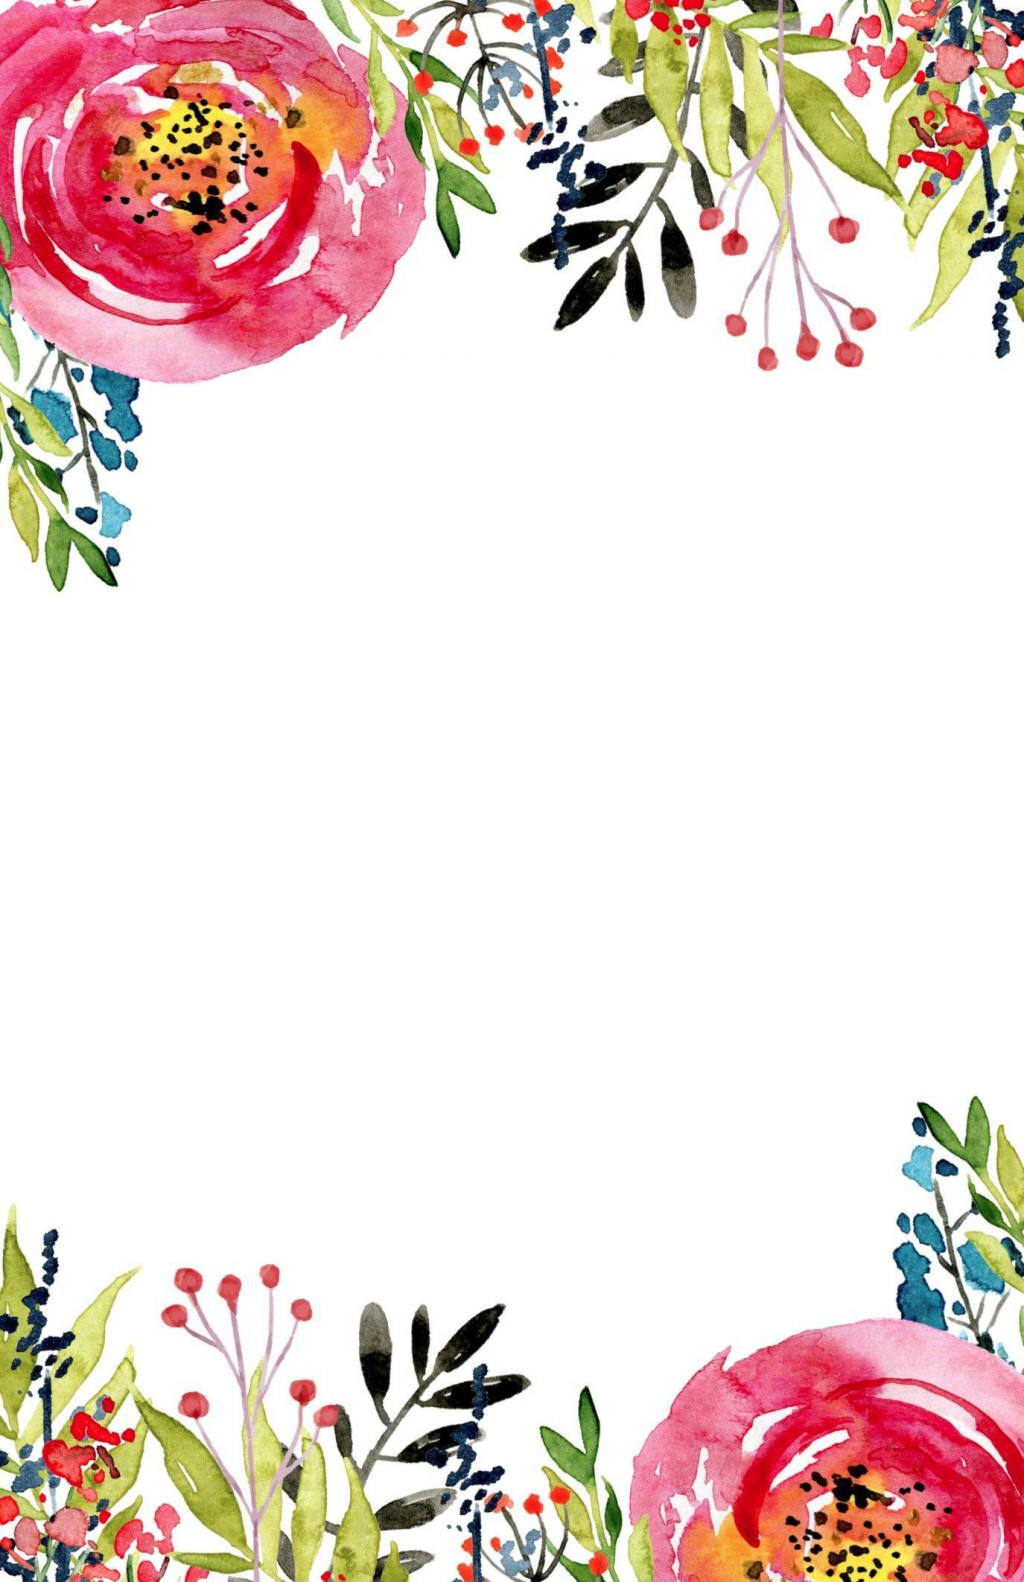 005 Incredible Free Invite Design Printable Photo  Wedding Place Card Template Birthday To PrintLarge